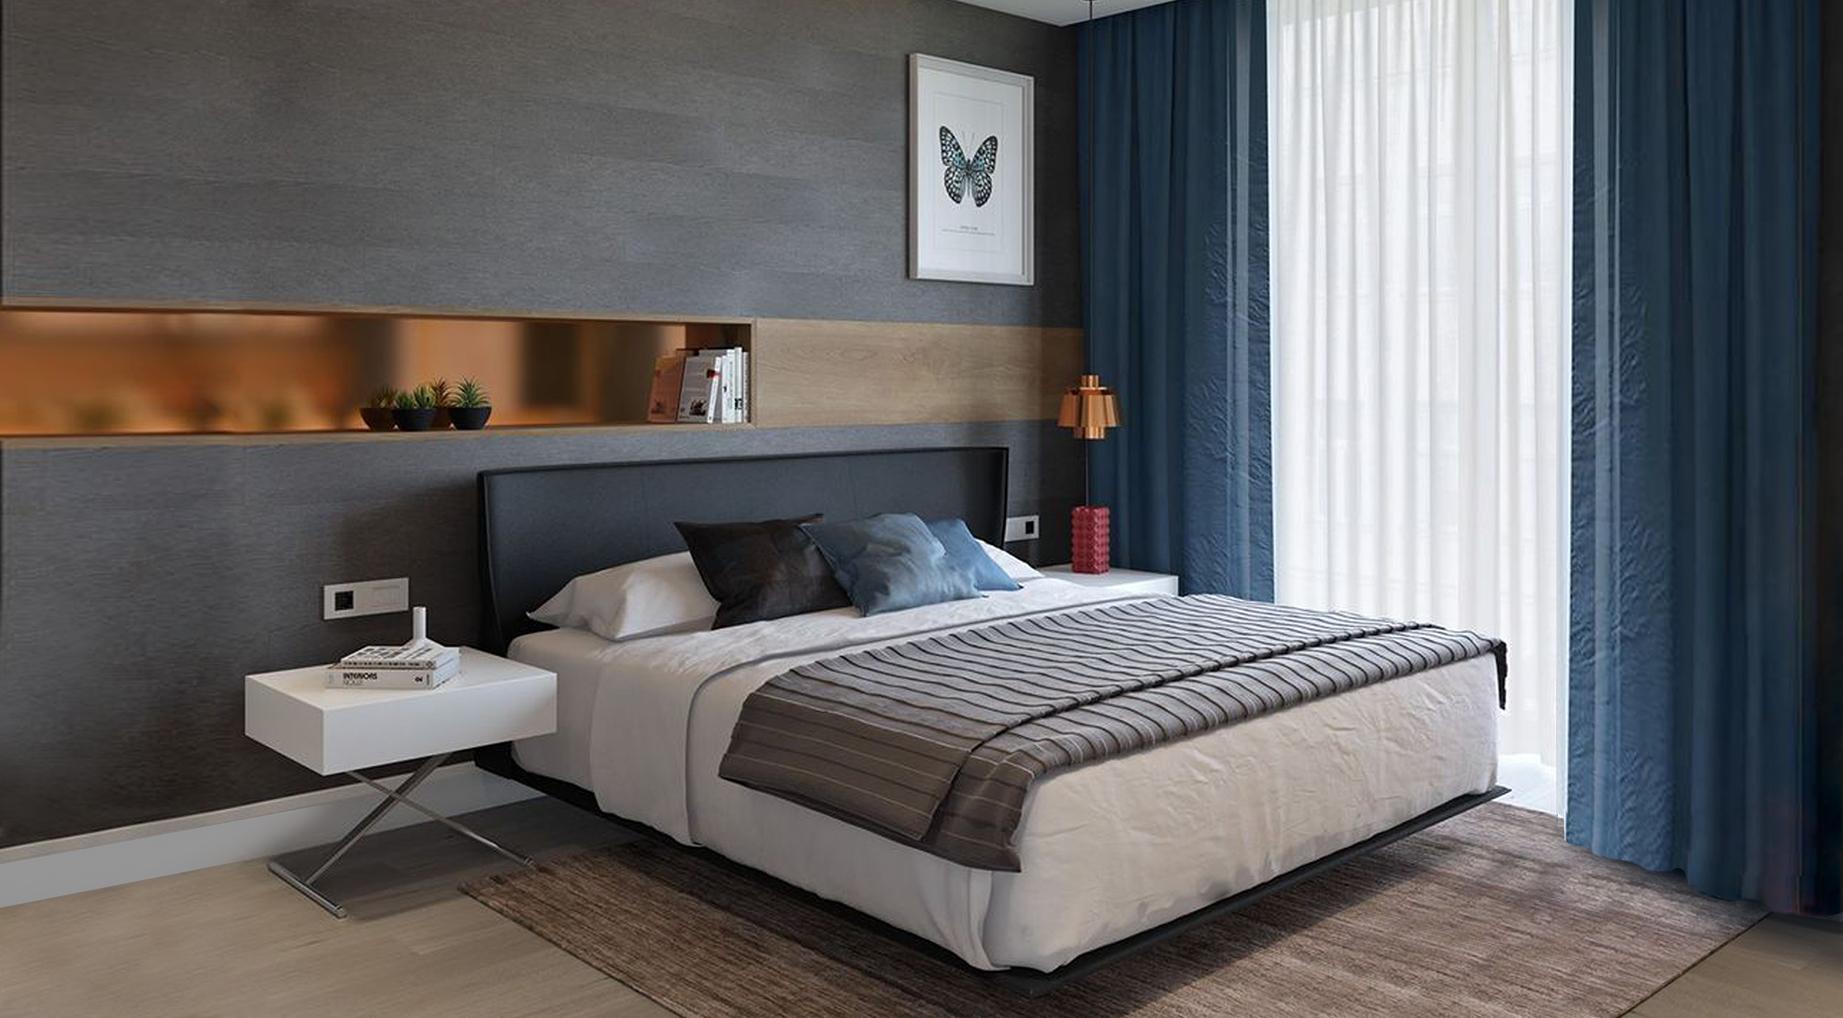 Borek RD Komfort interiér ložnice